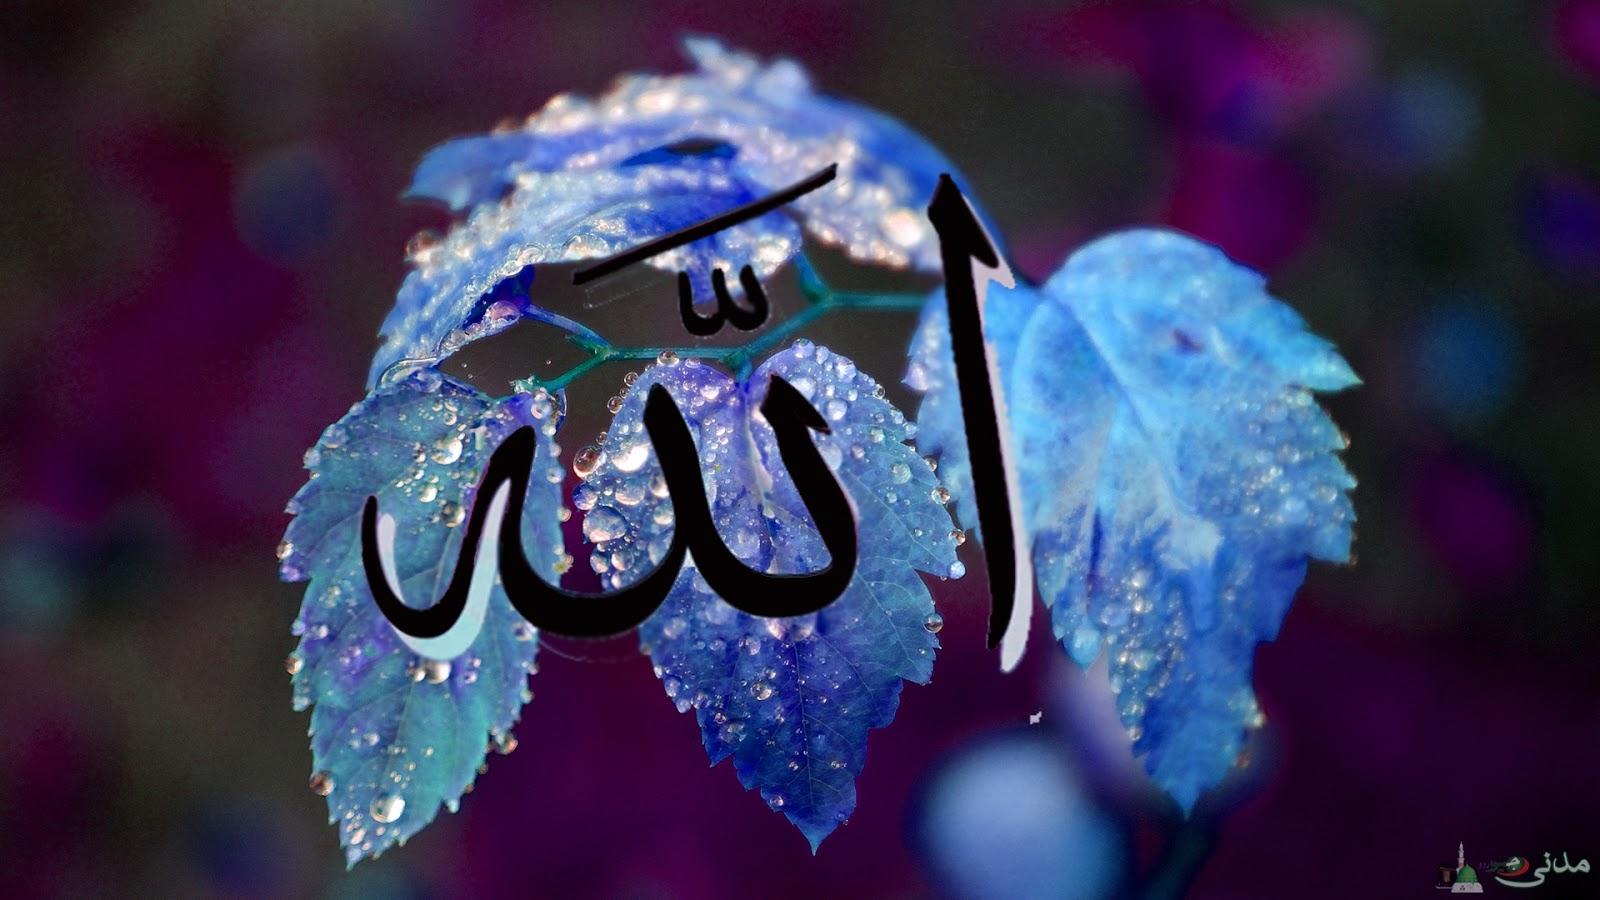 allah names allah names allah names allah names allah names 1600x900